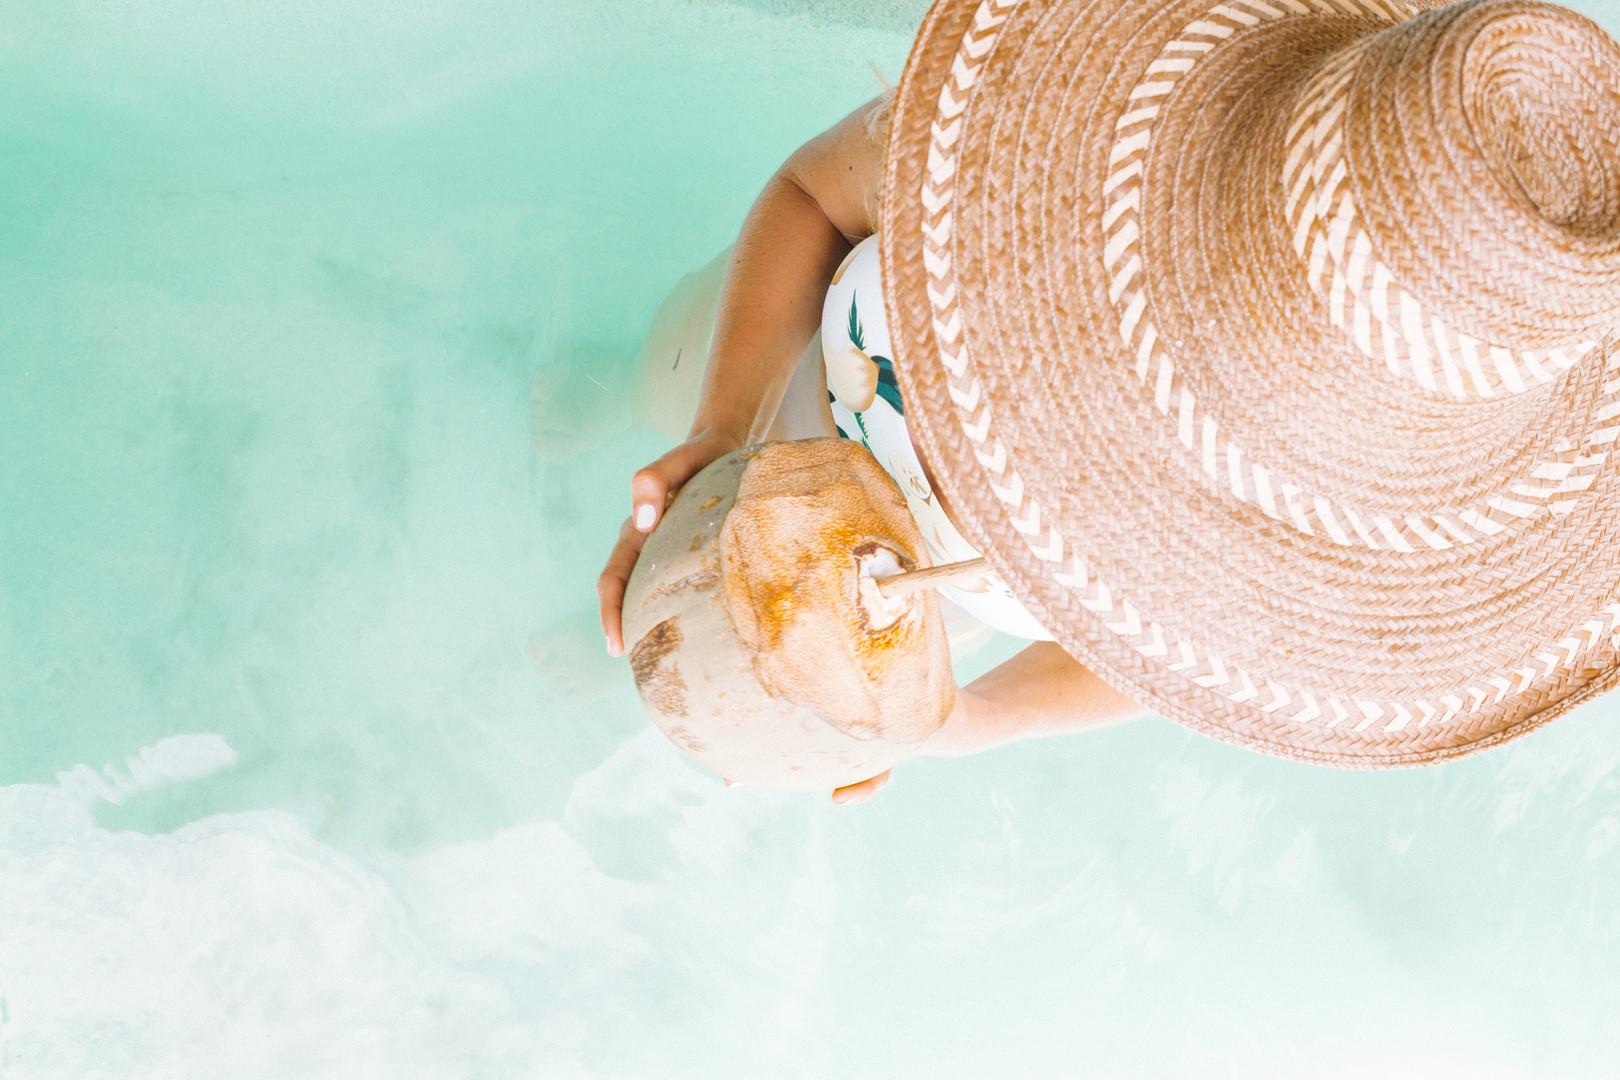 Bali   Image by Emily Bauman